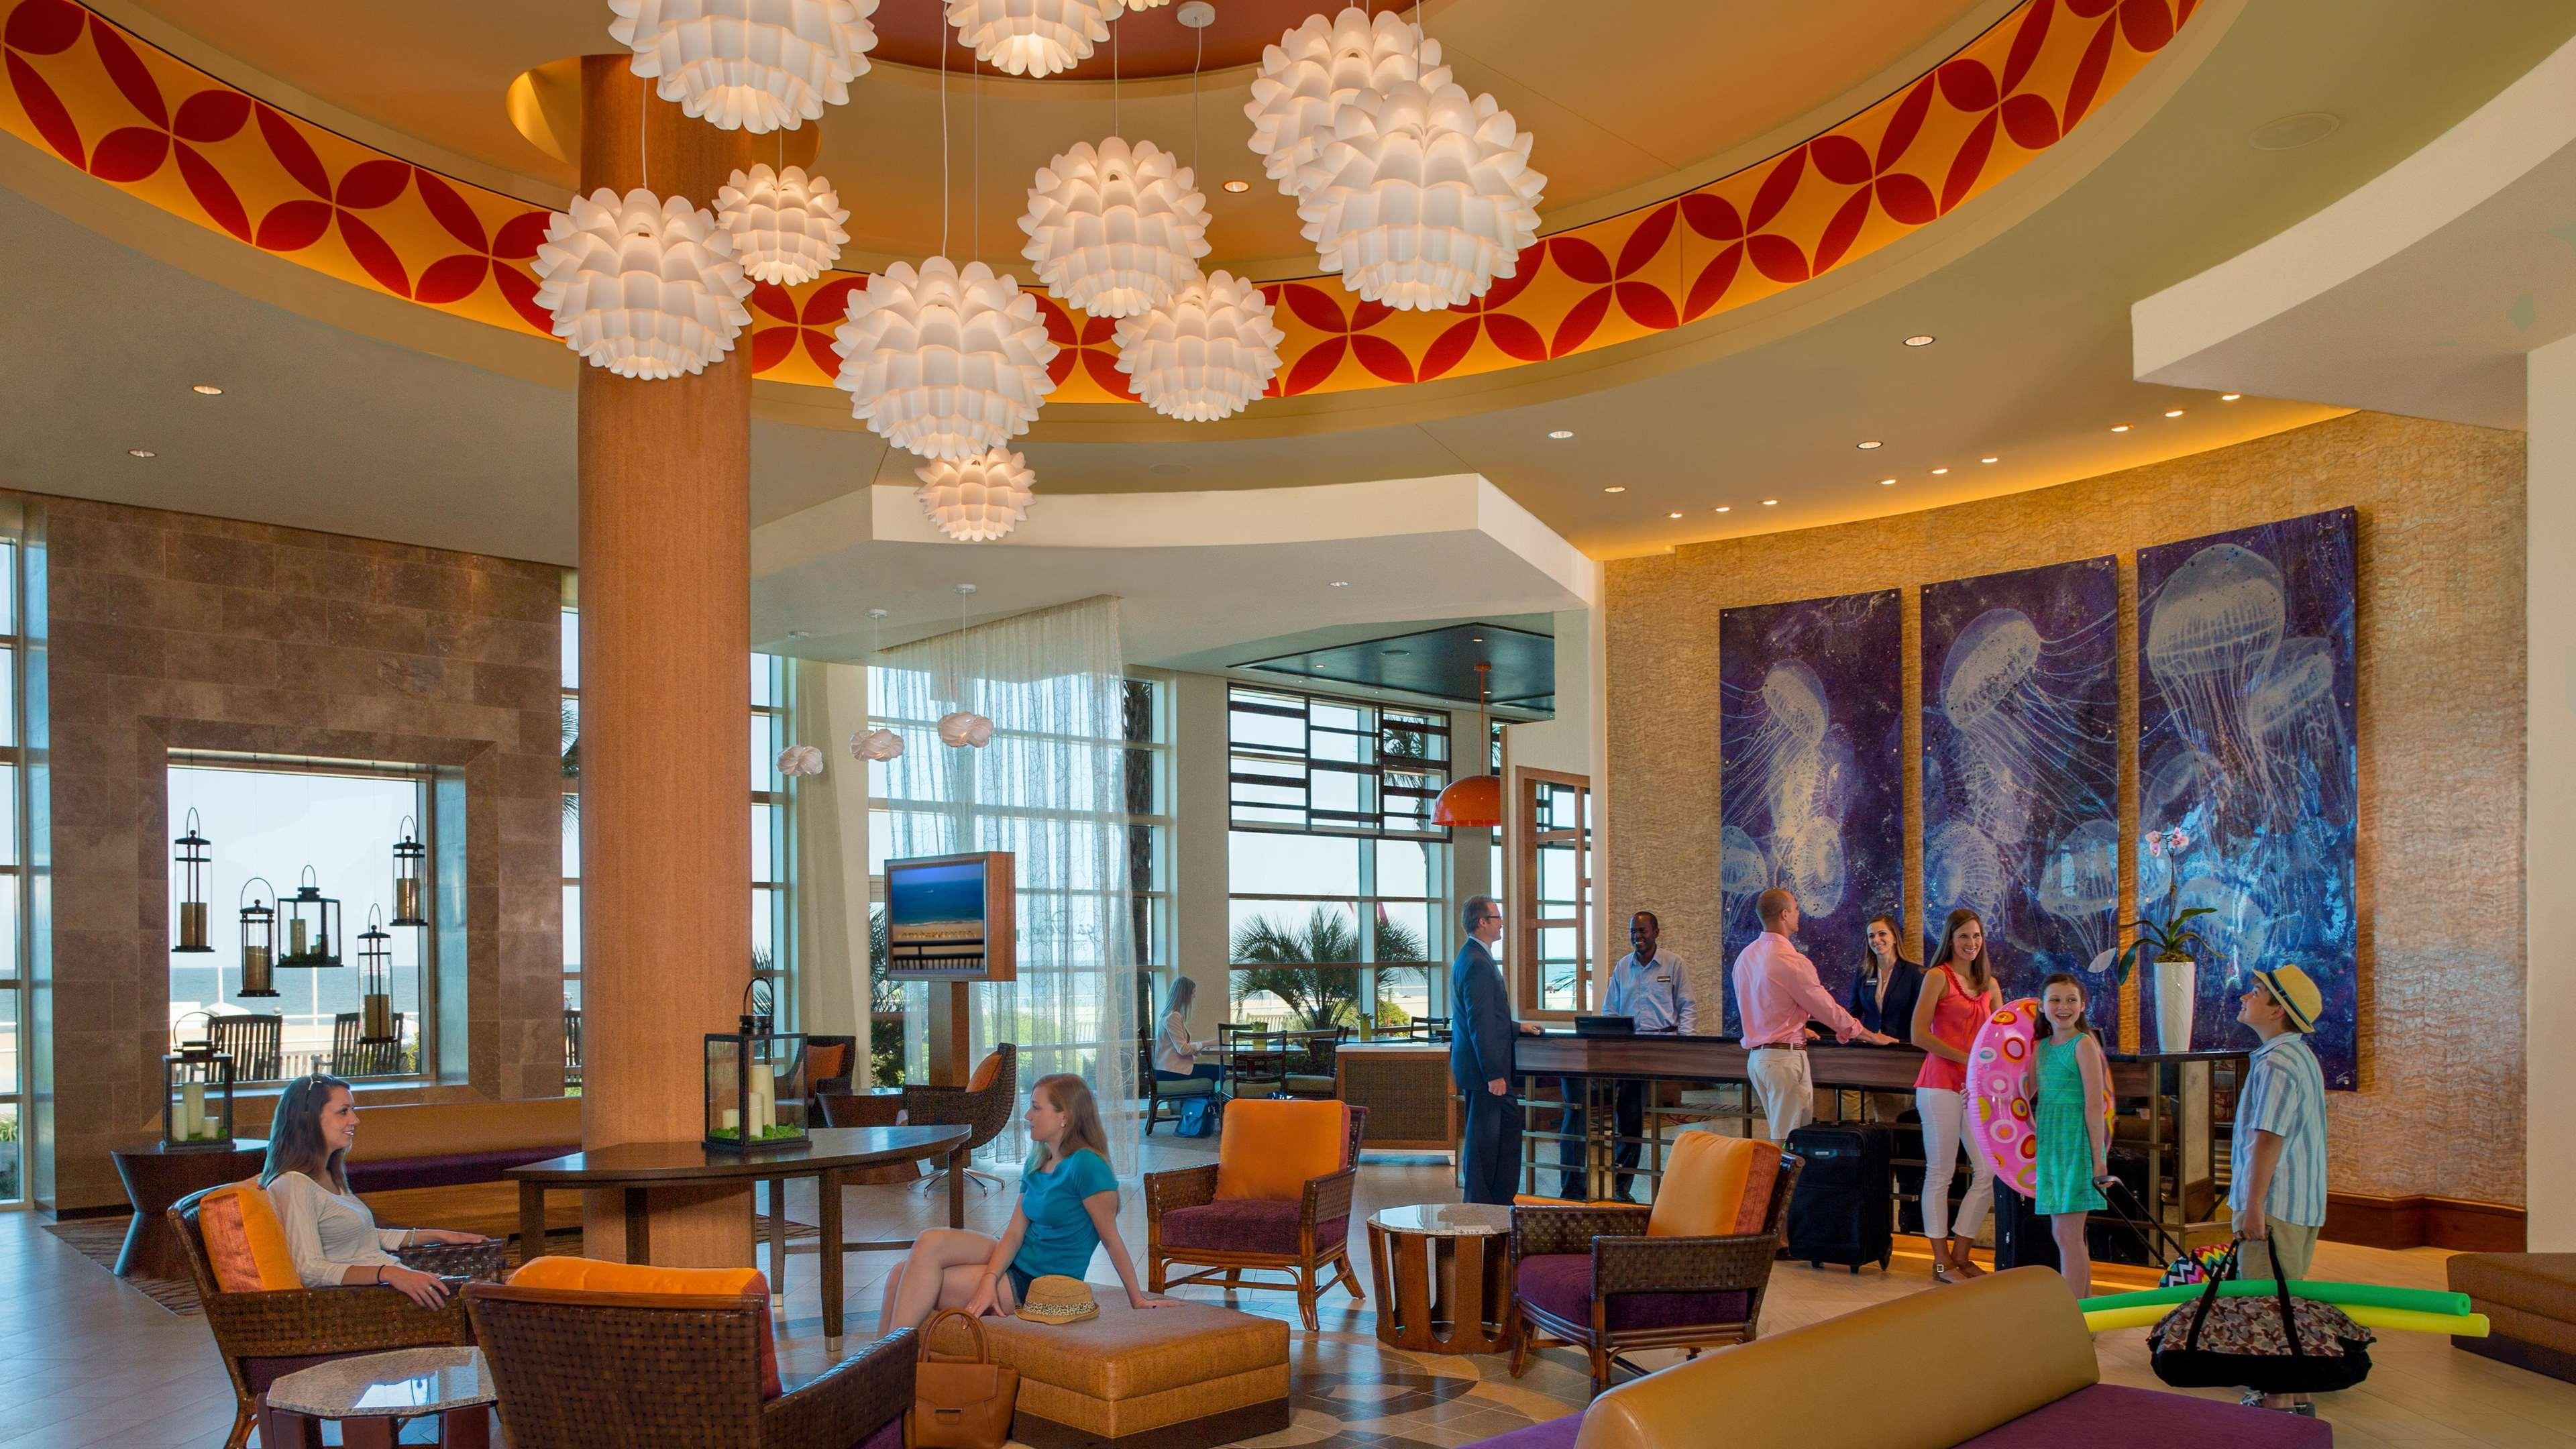 Hilton Garden Inn Virginia Beach Oceanfront image 9